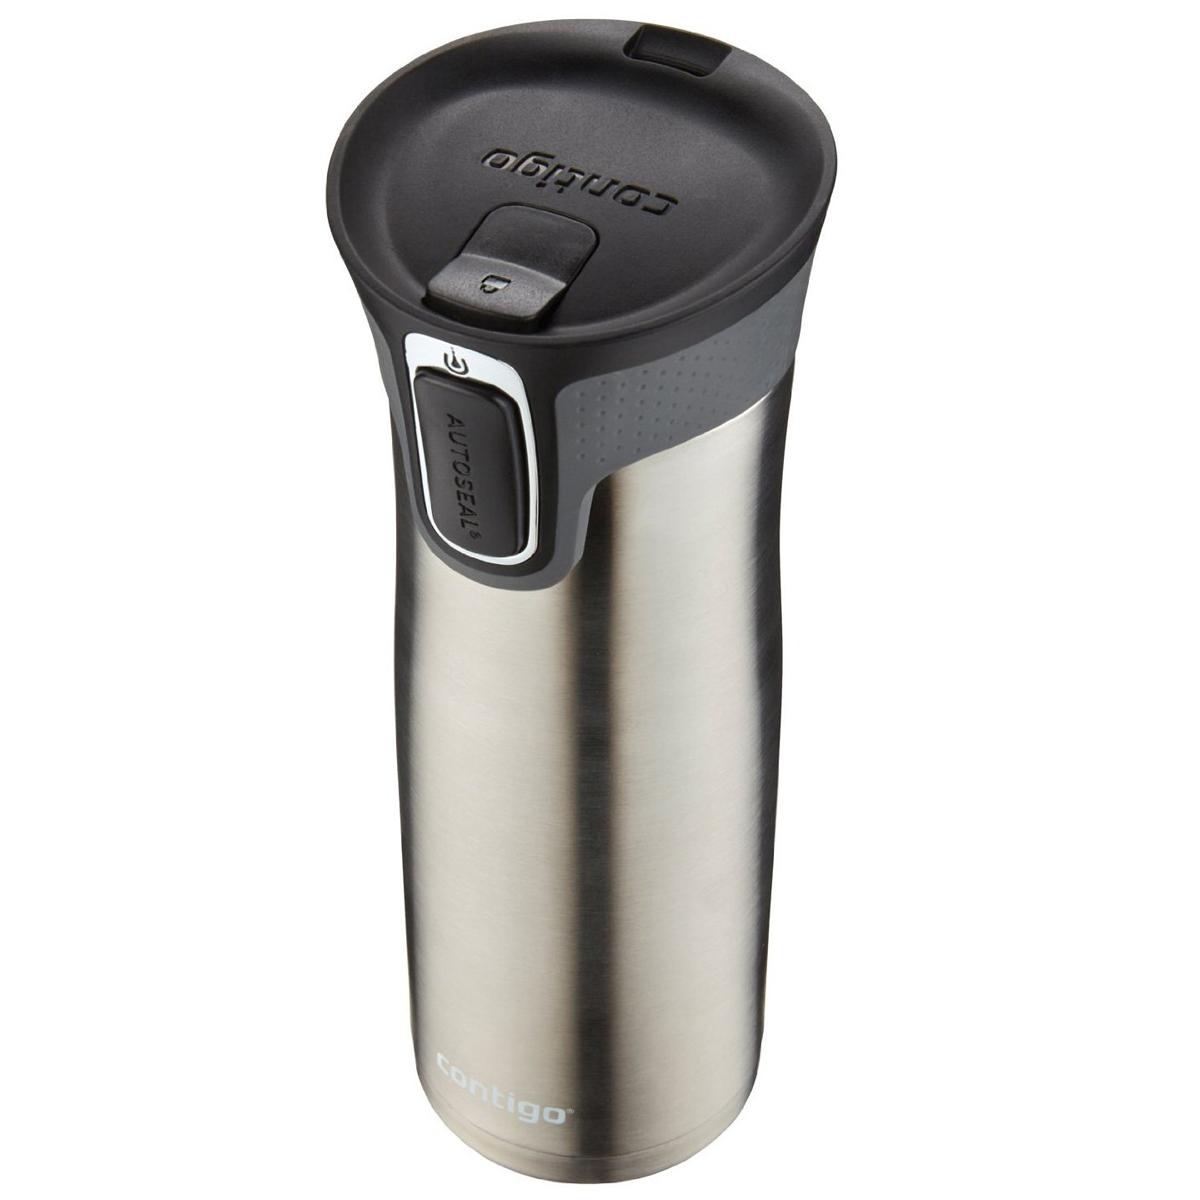 thumbnail 39 - Contigo 20 oz. West Loop 2.0 AutoSeal Insulated Stainless Steel Travel Mug